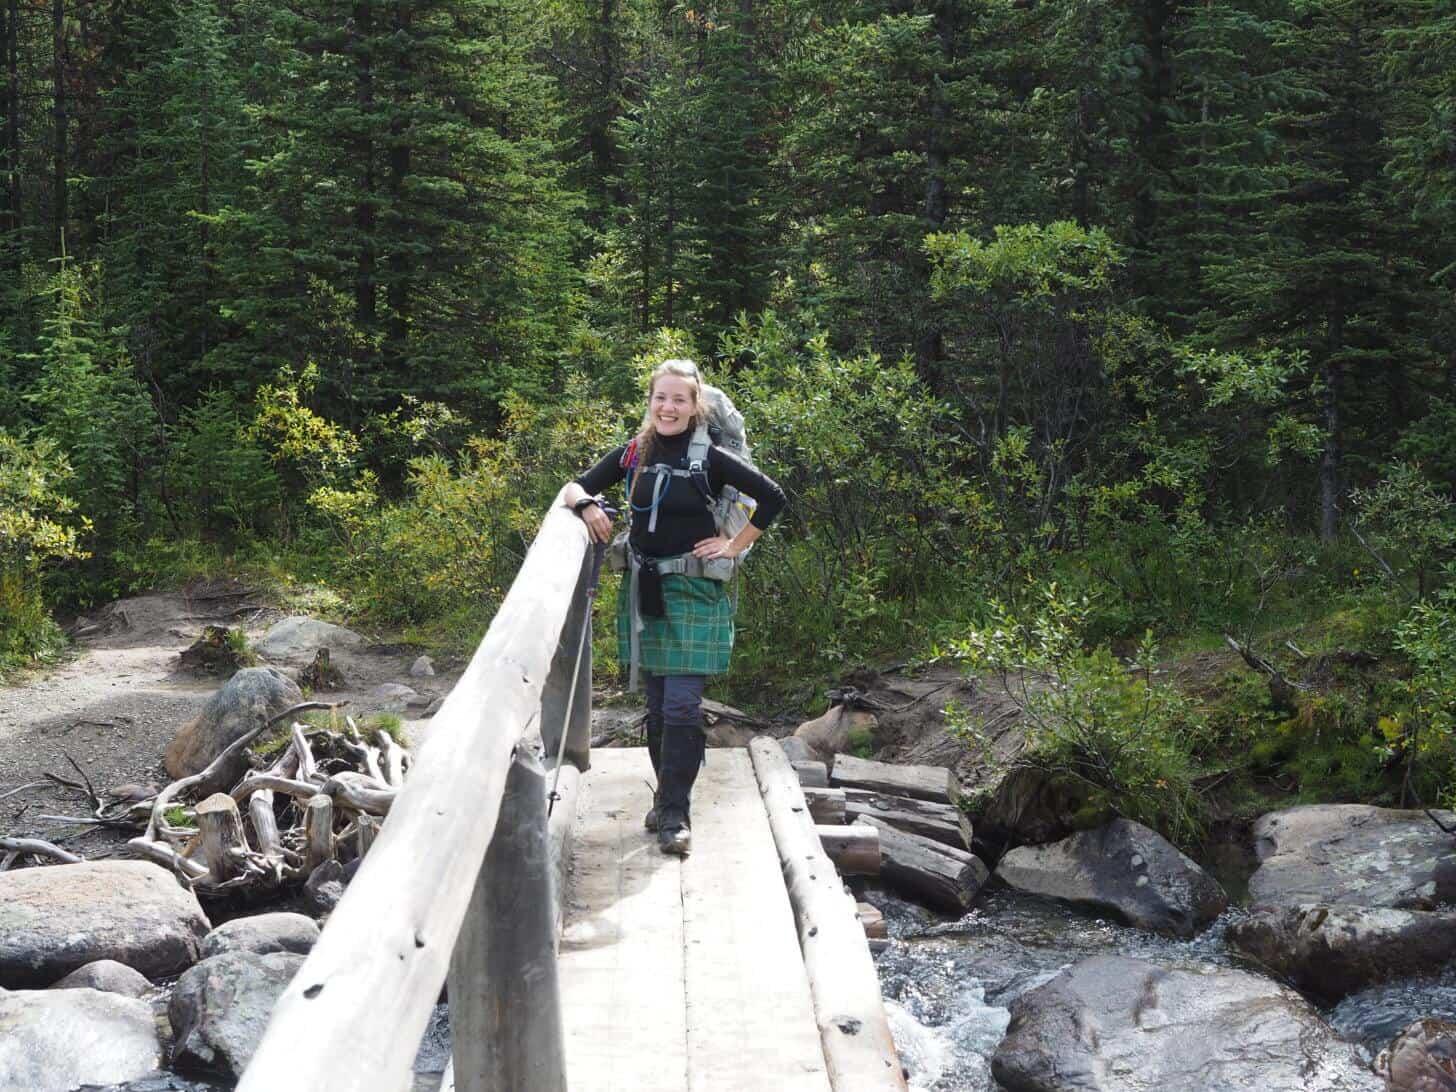 Skyline Trail:While crossing a bridge, I display the Sport Kilt Hiking Kilt I tested on the Skyline Trail.